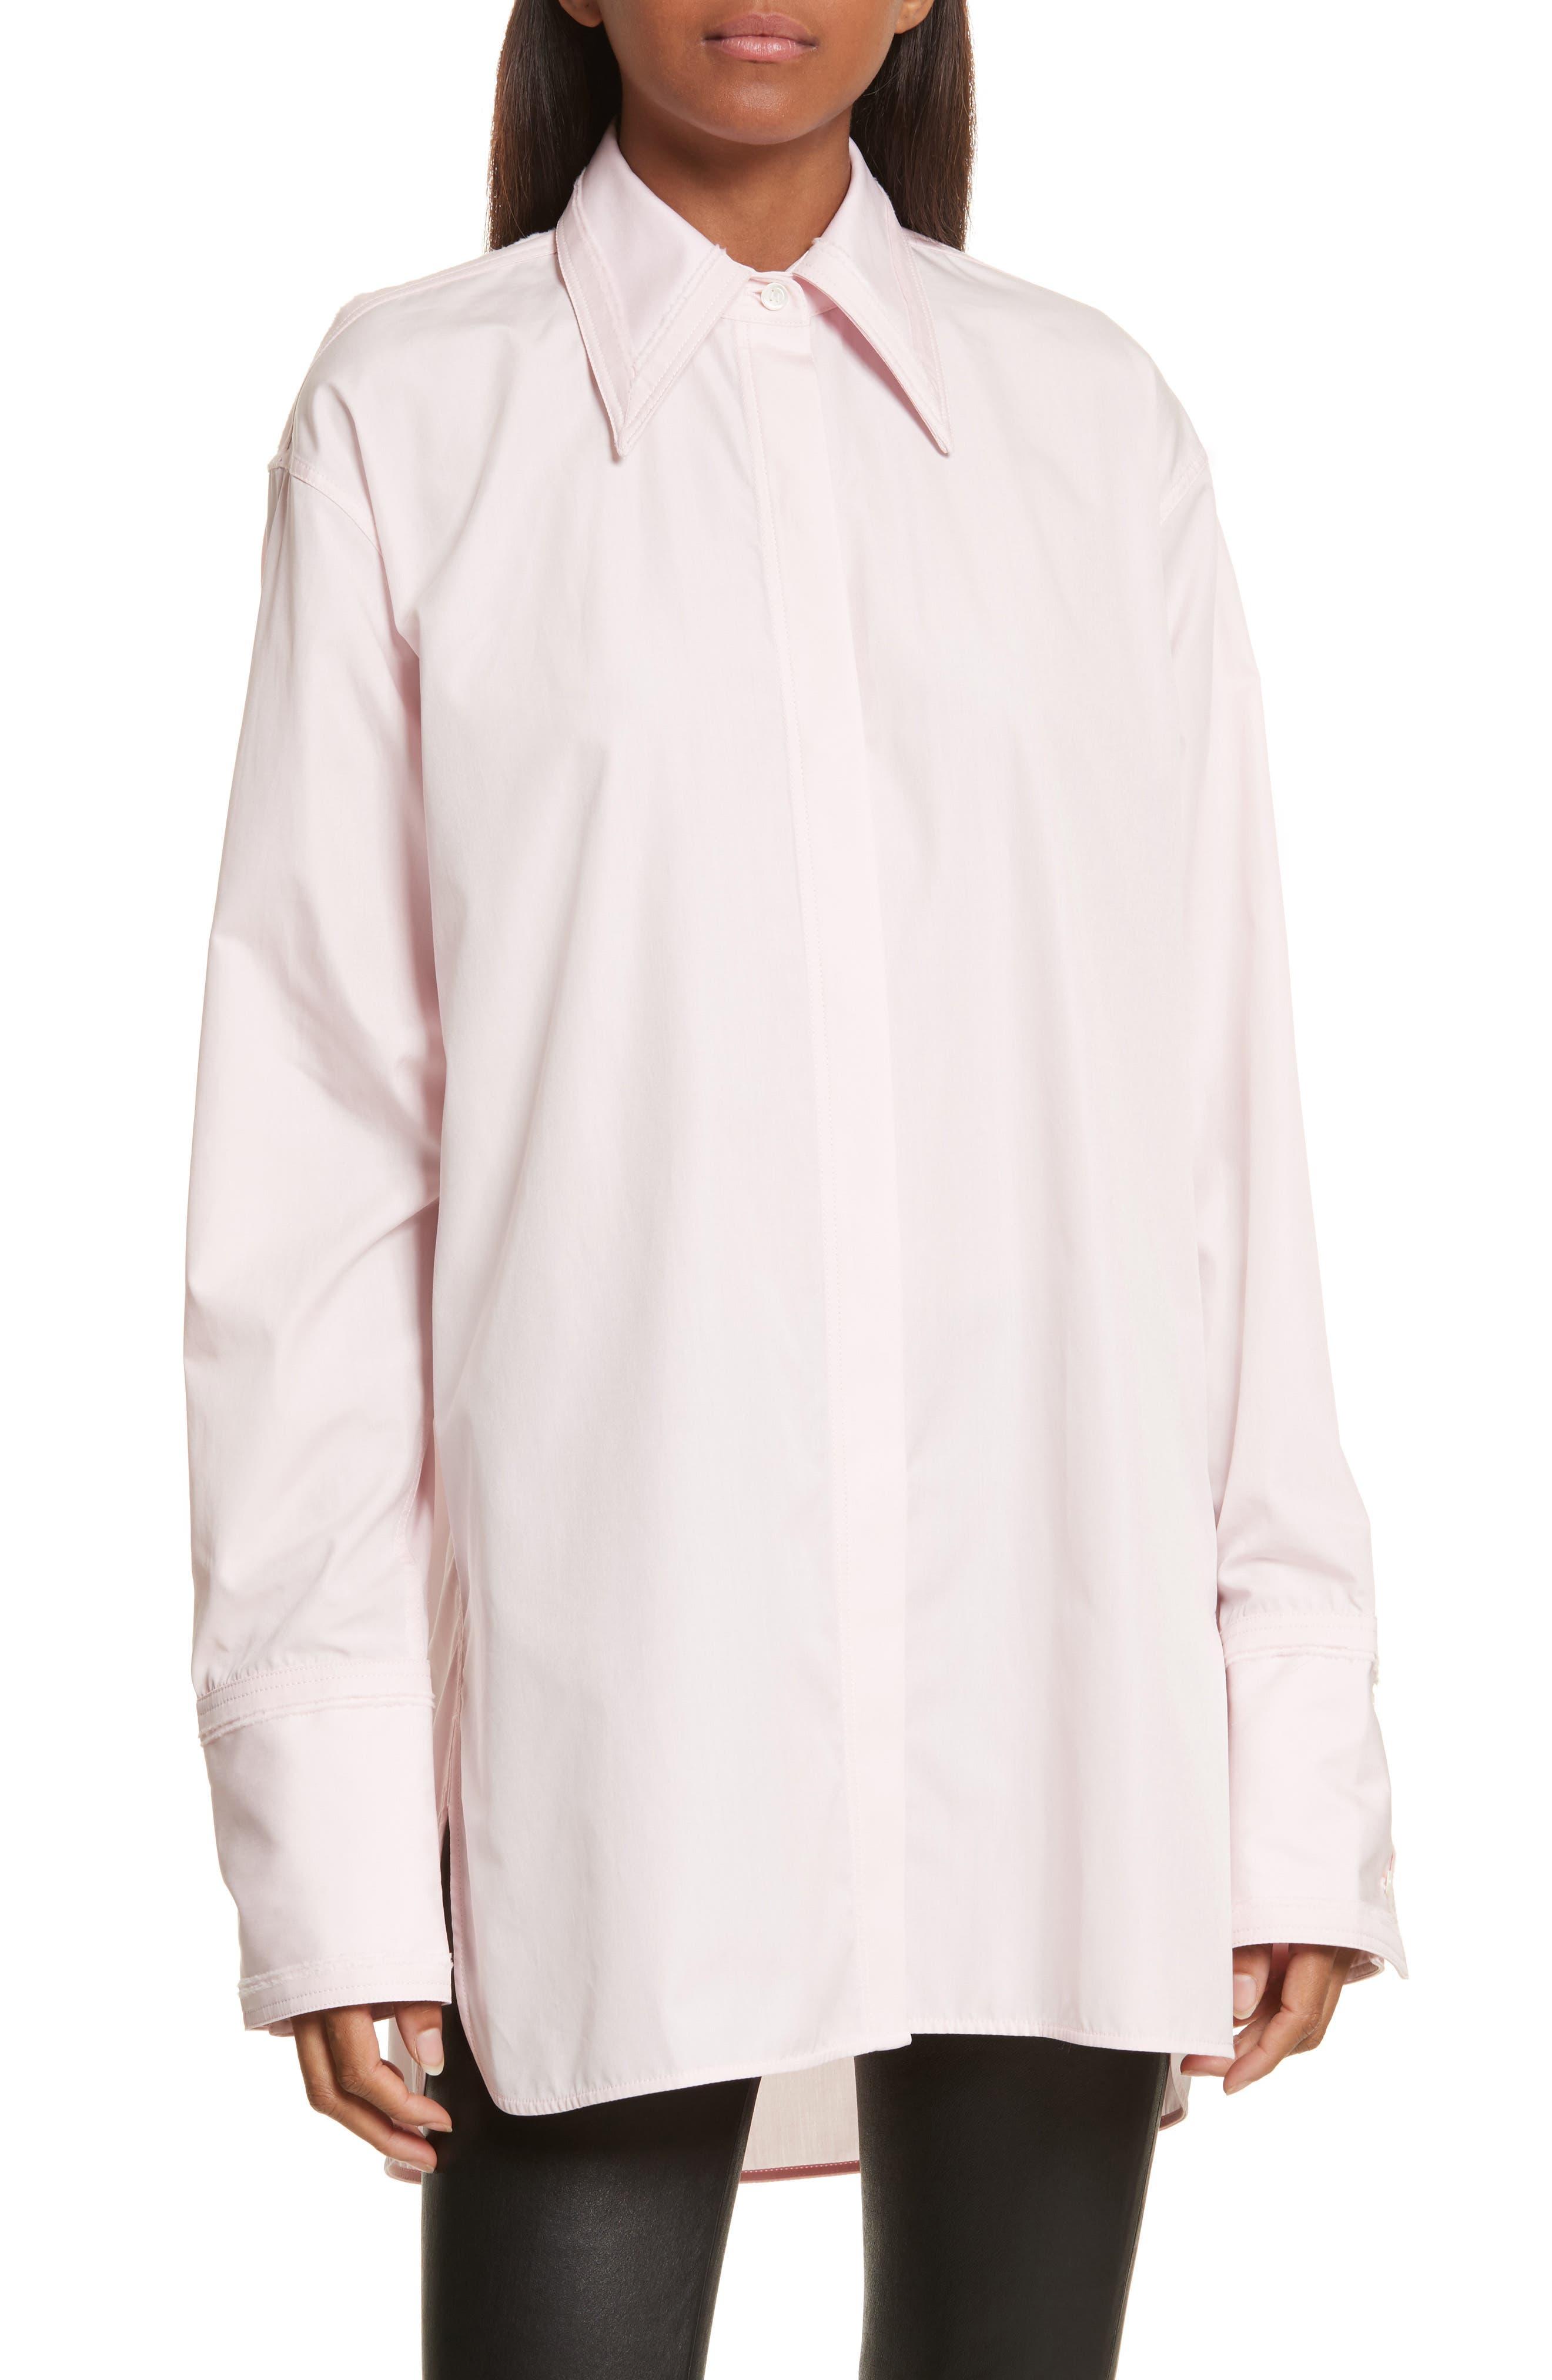 Main Image - Helmut Lang Cutout Cotton Poplin Shirt